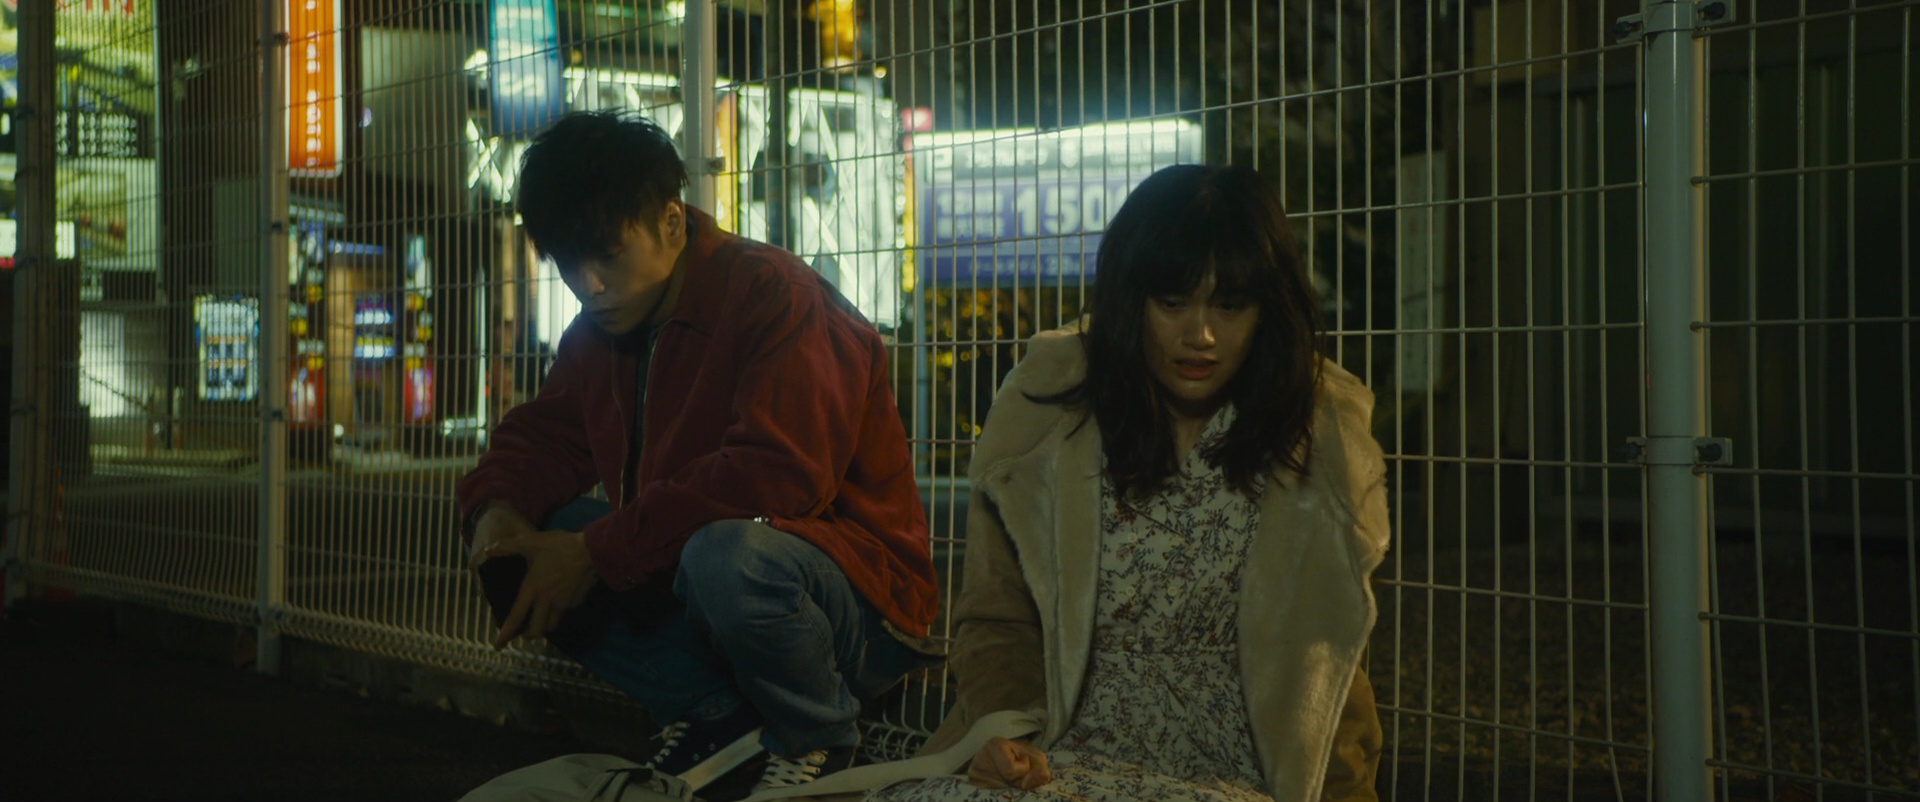 English Review: First Love (Miike Takashi, 2019)